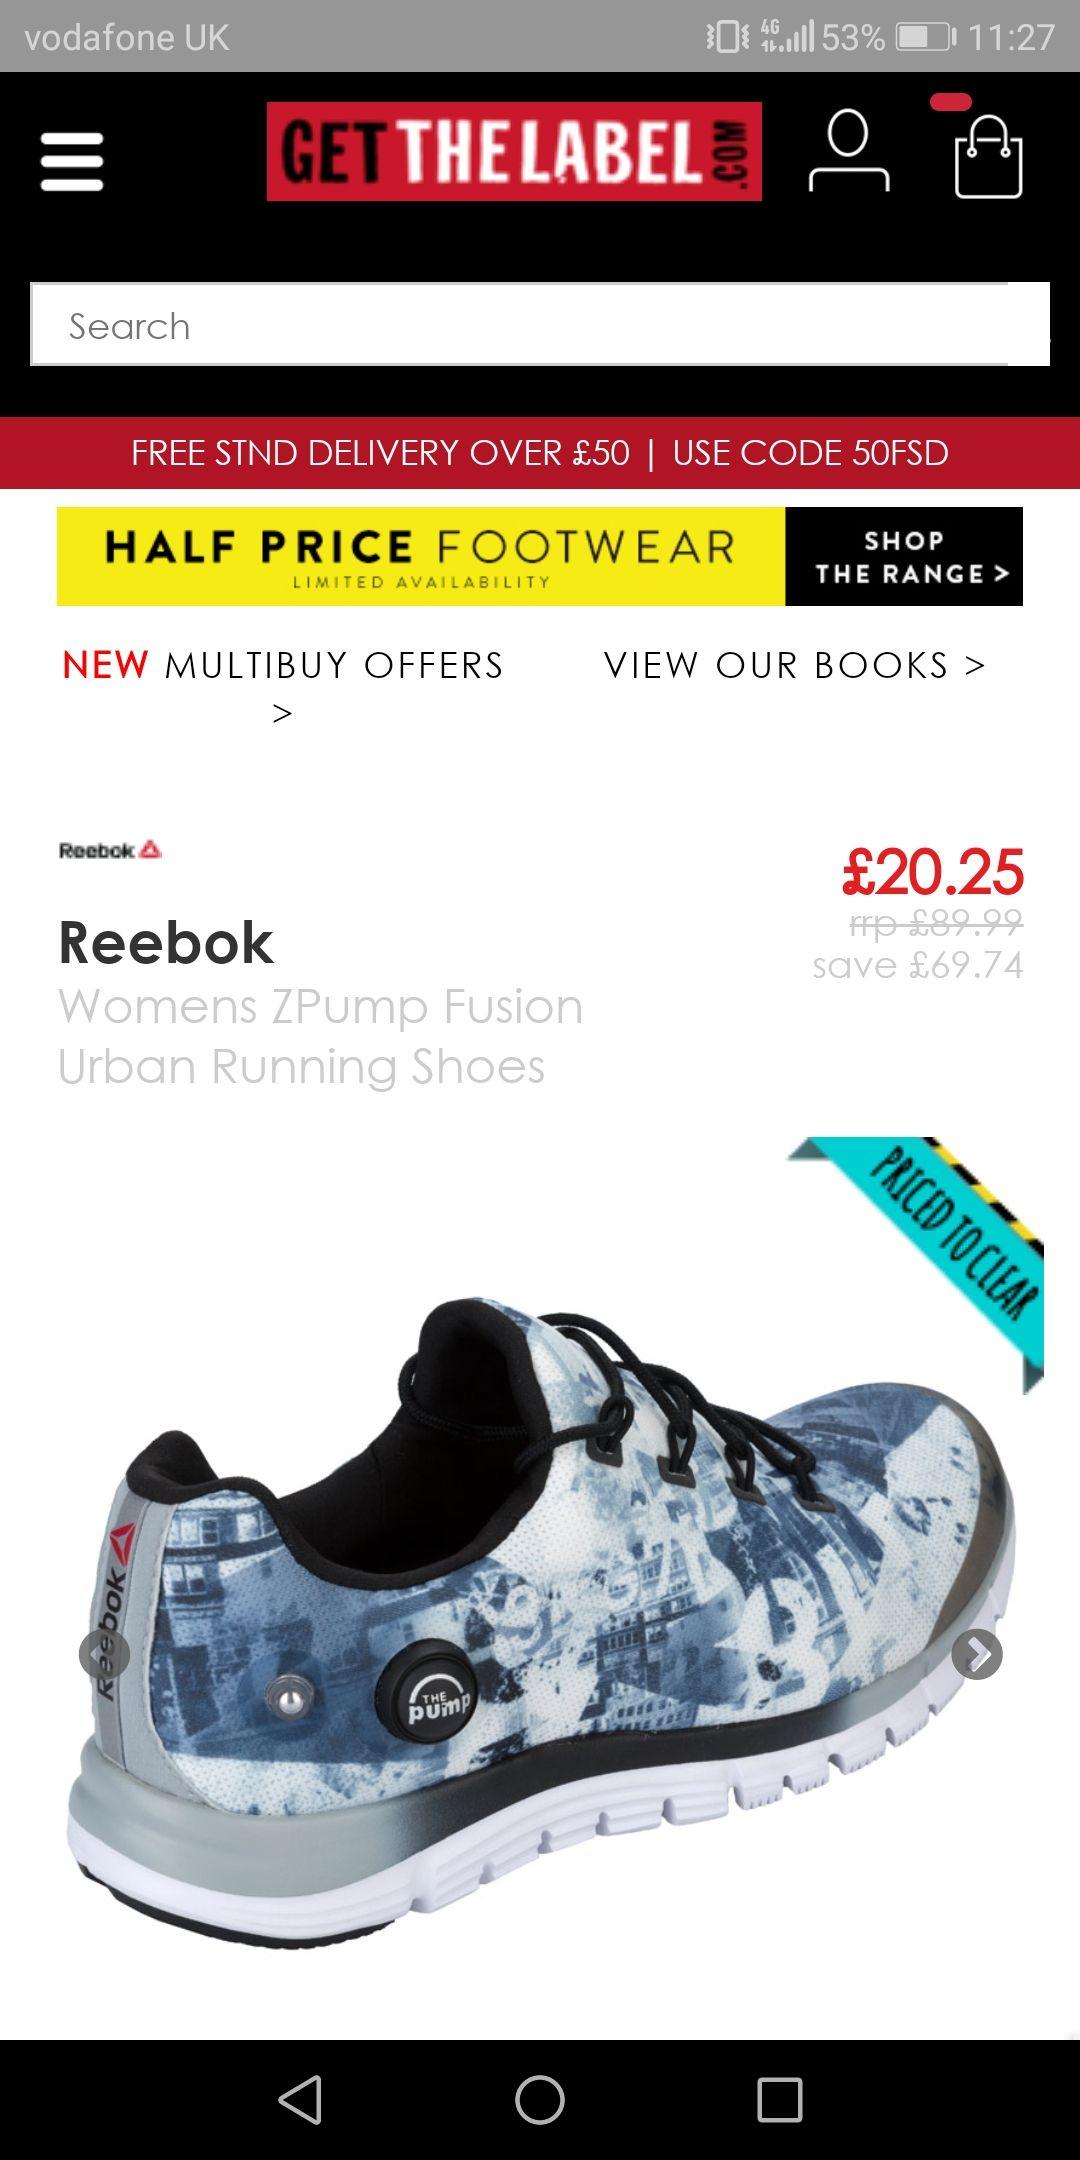 Reebok women's zpump fusion urban running shoes @ getthelabel.com